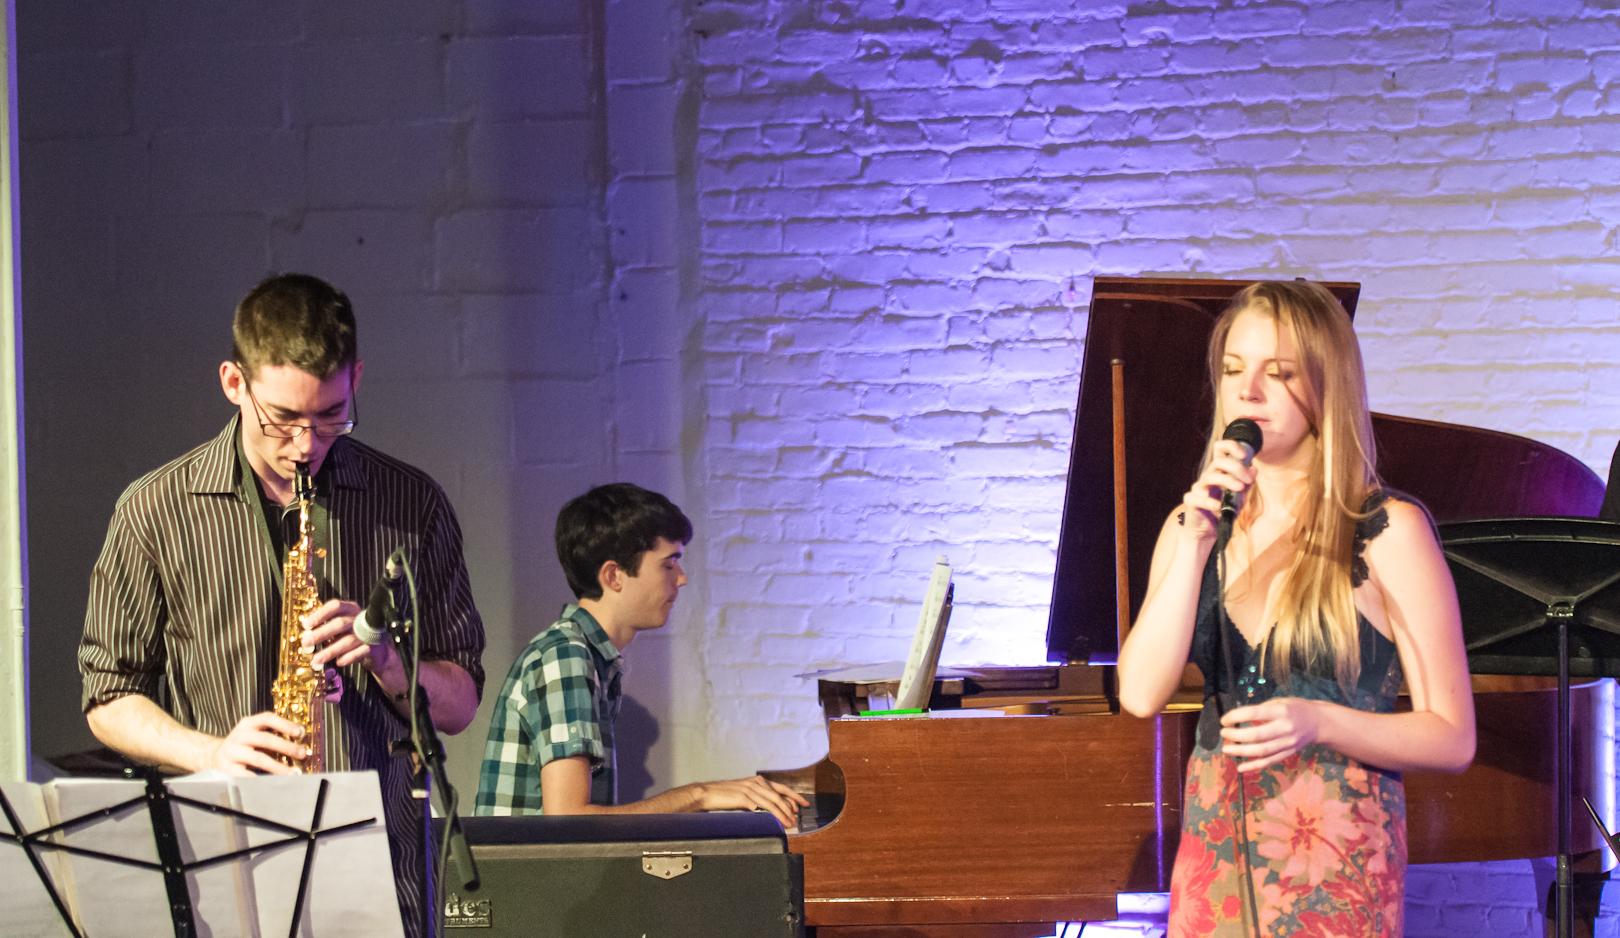 Michael Thomas, Lee Fish and Aubrey Johnson at Inner Circle Music Festival at Shapeshifter Lab